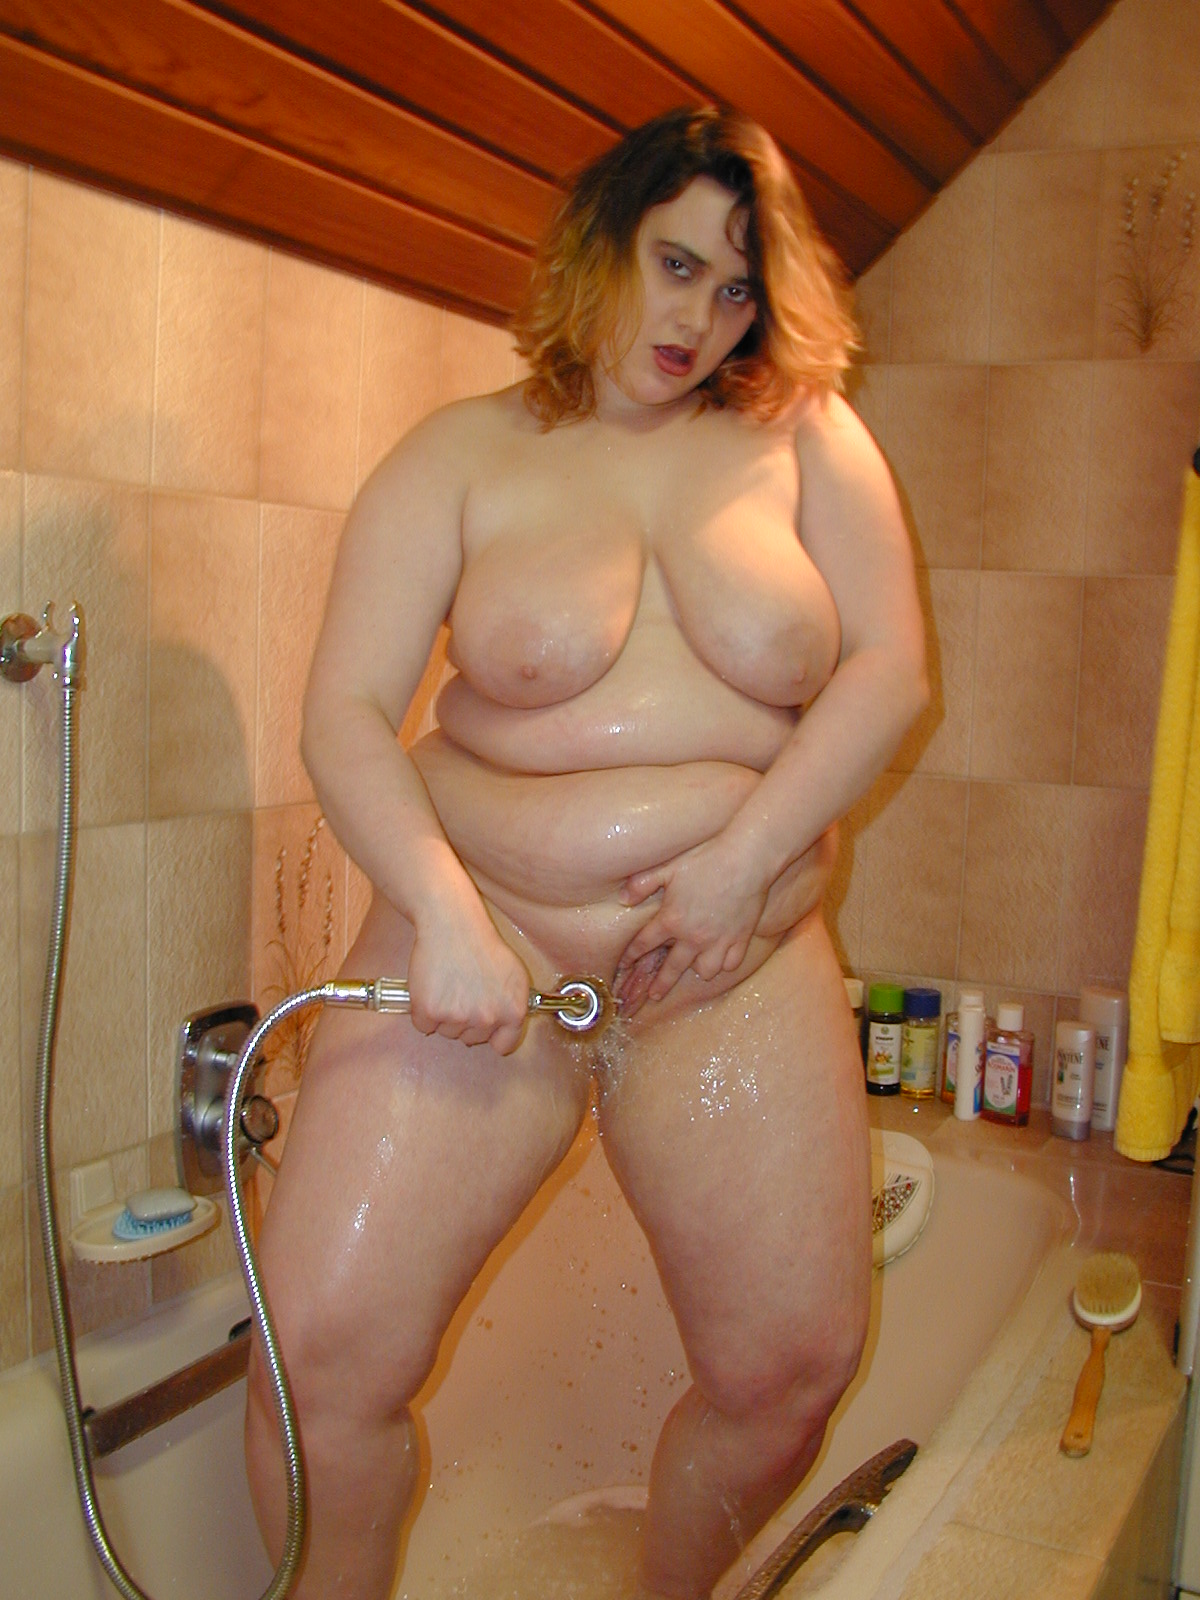 fette frauen nackt